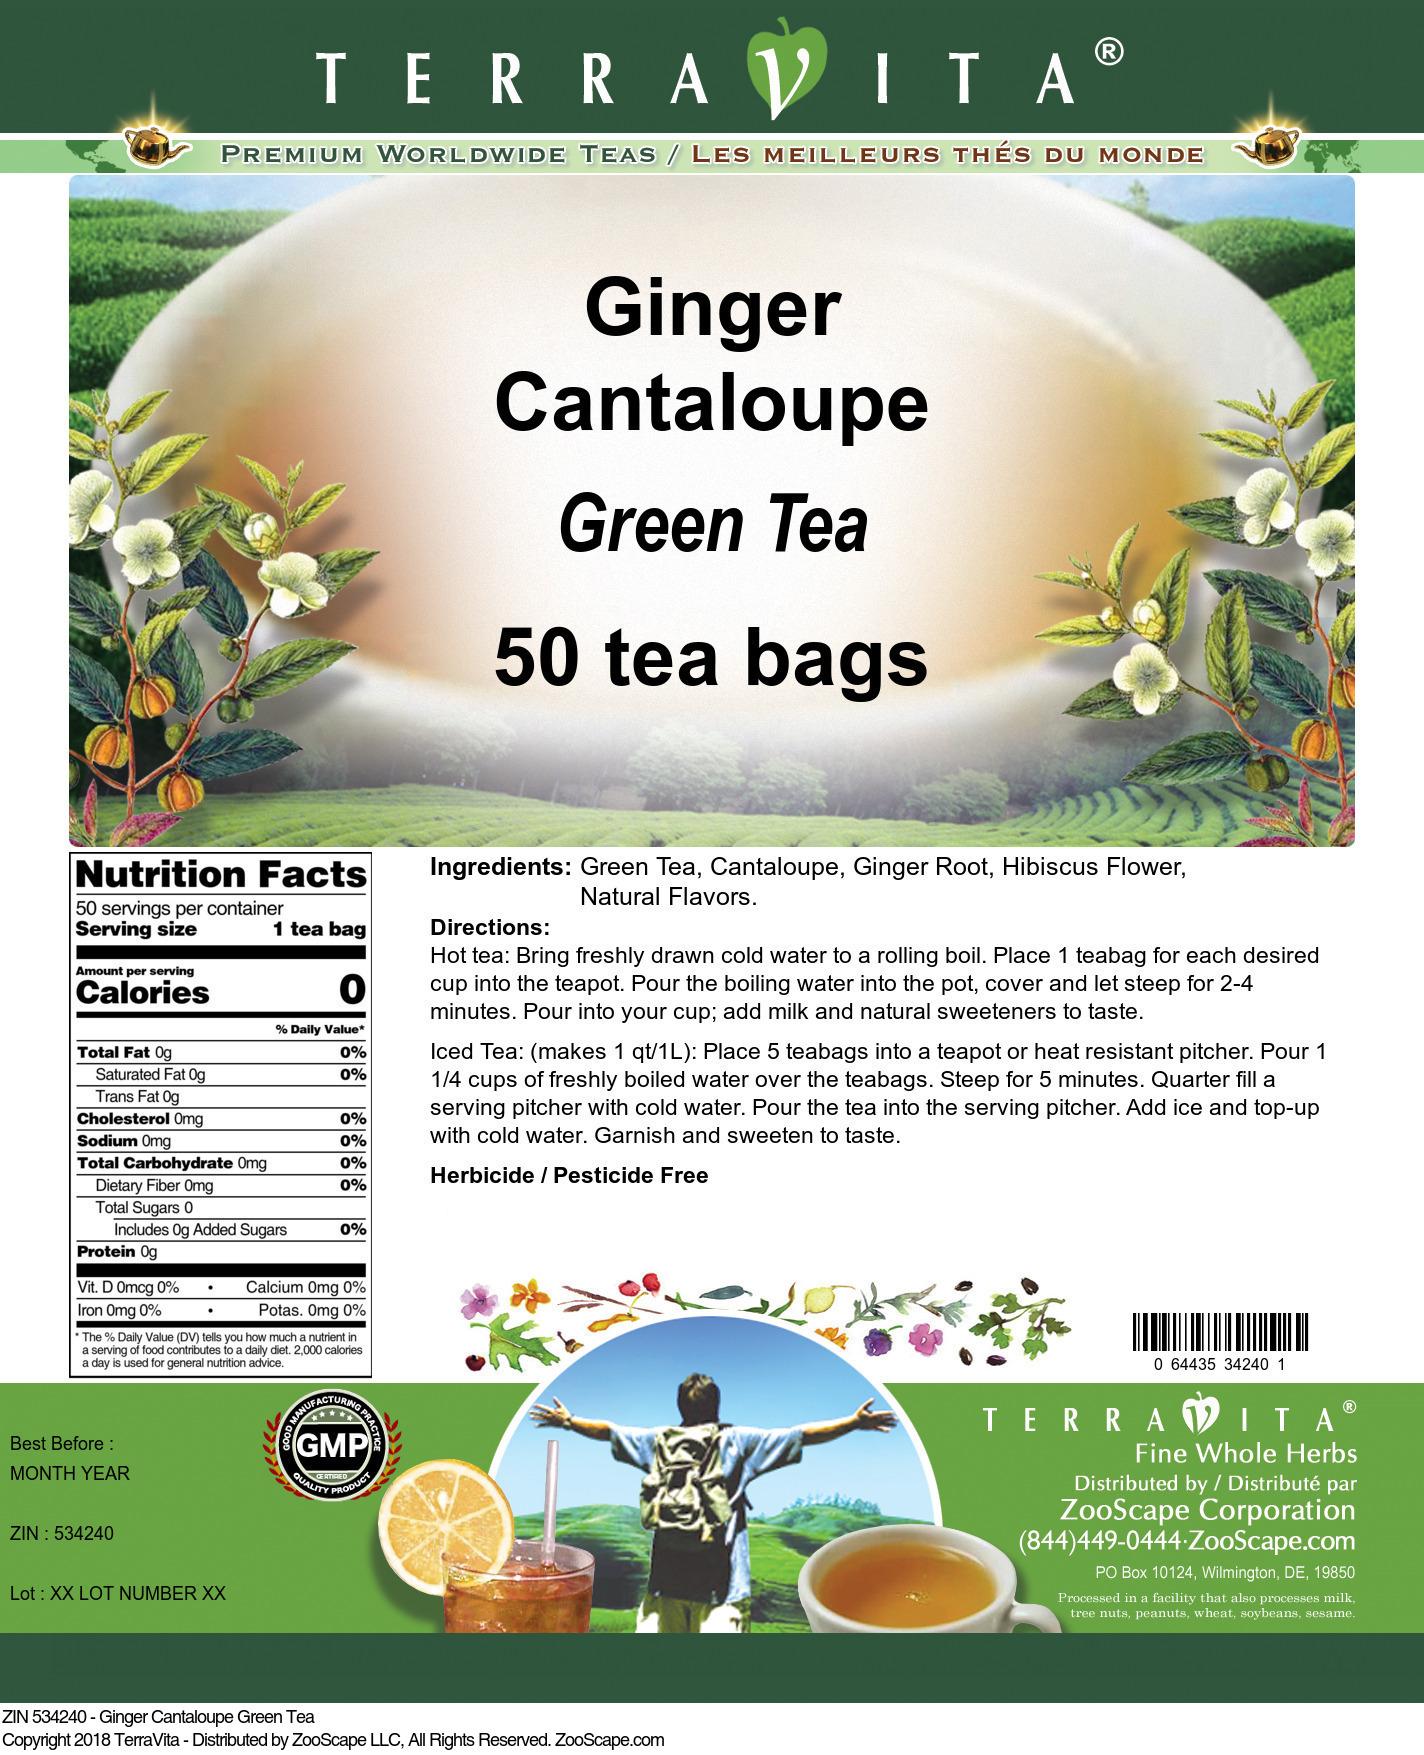 Ginger Cantaloupe Green Tea